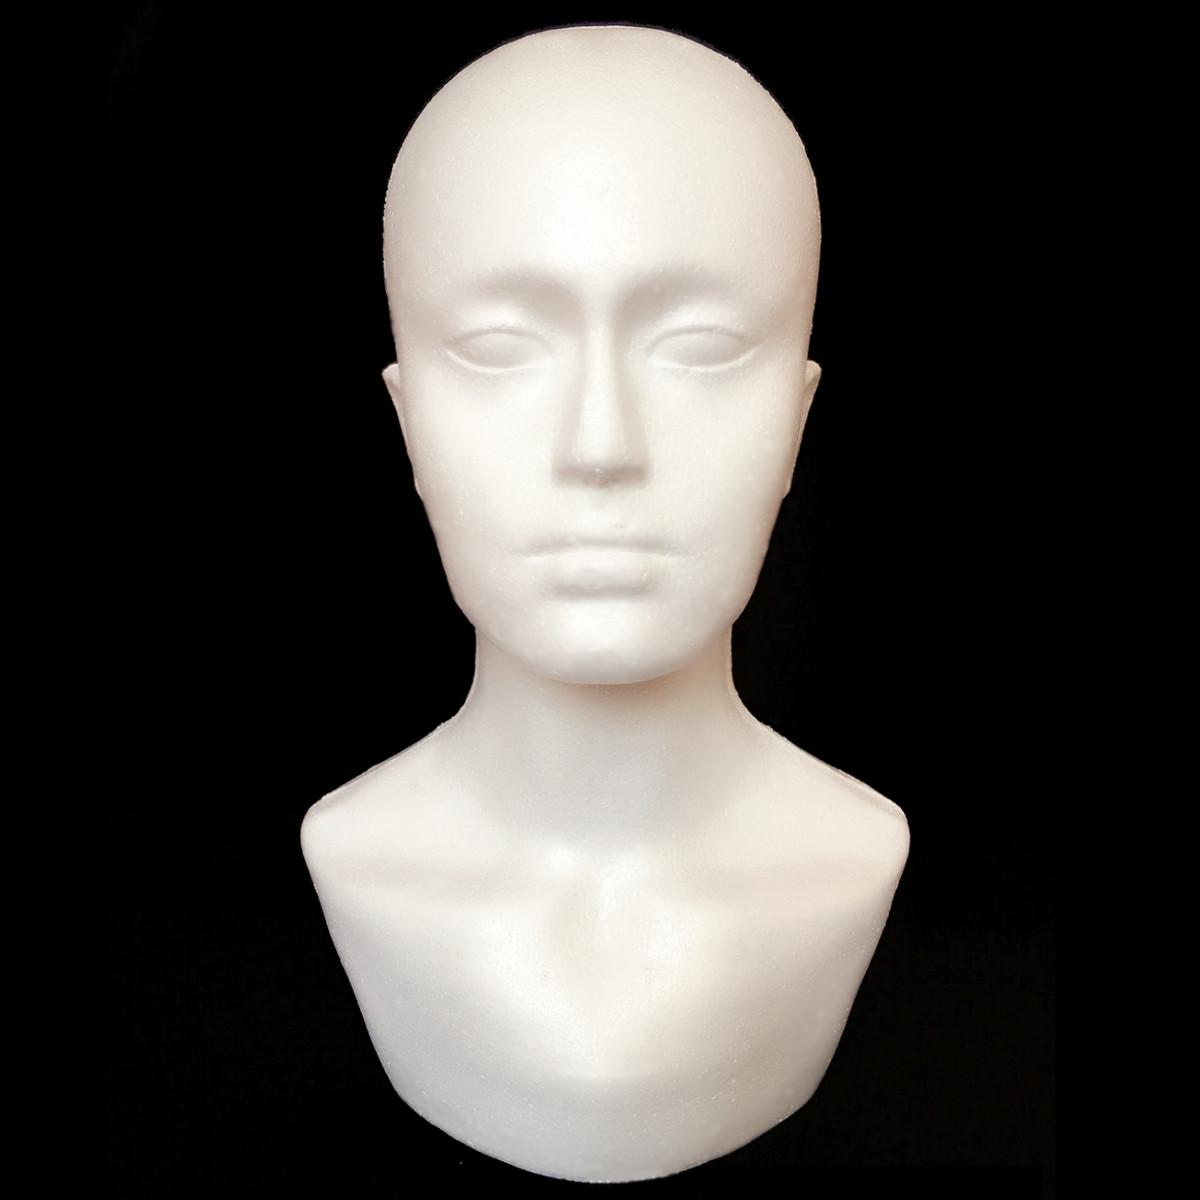 Male Polystyrene Foam Mannequin Stand Model Displ